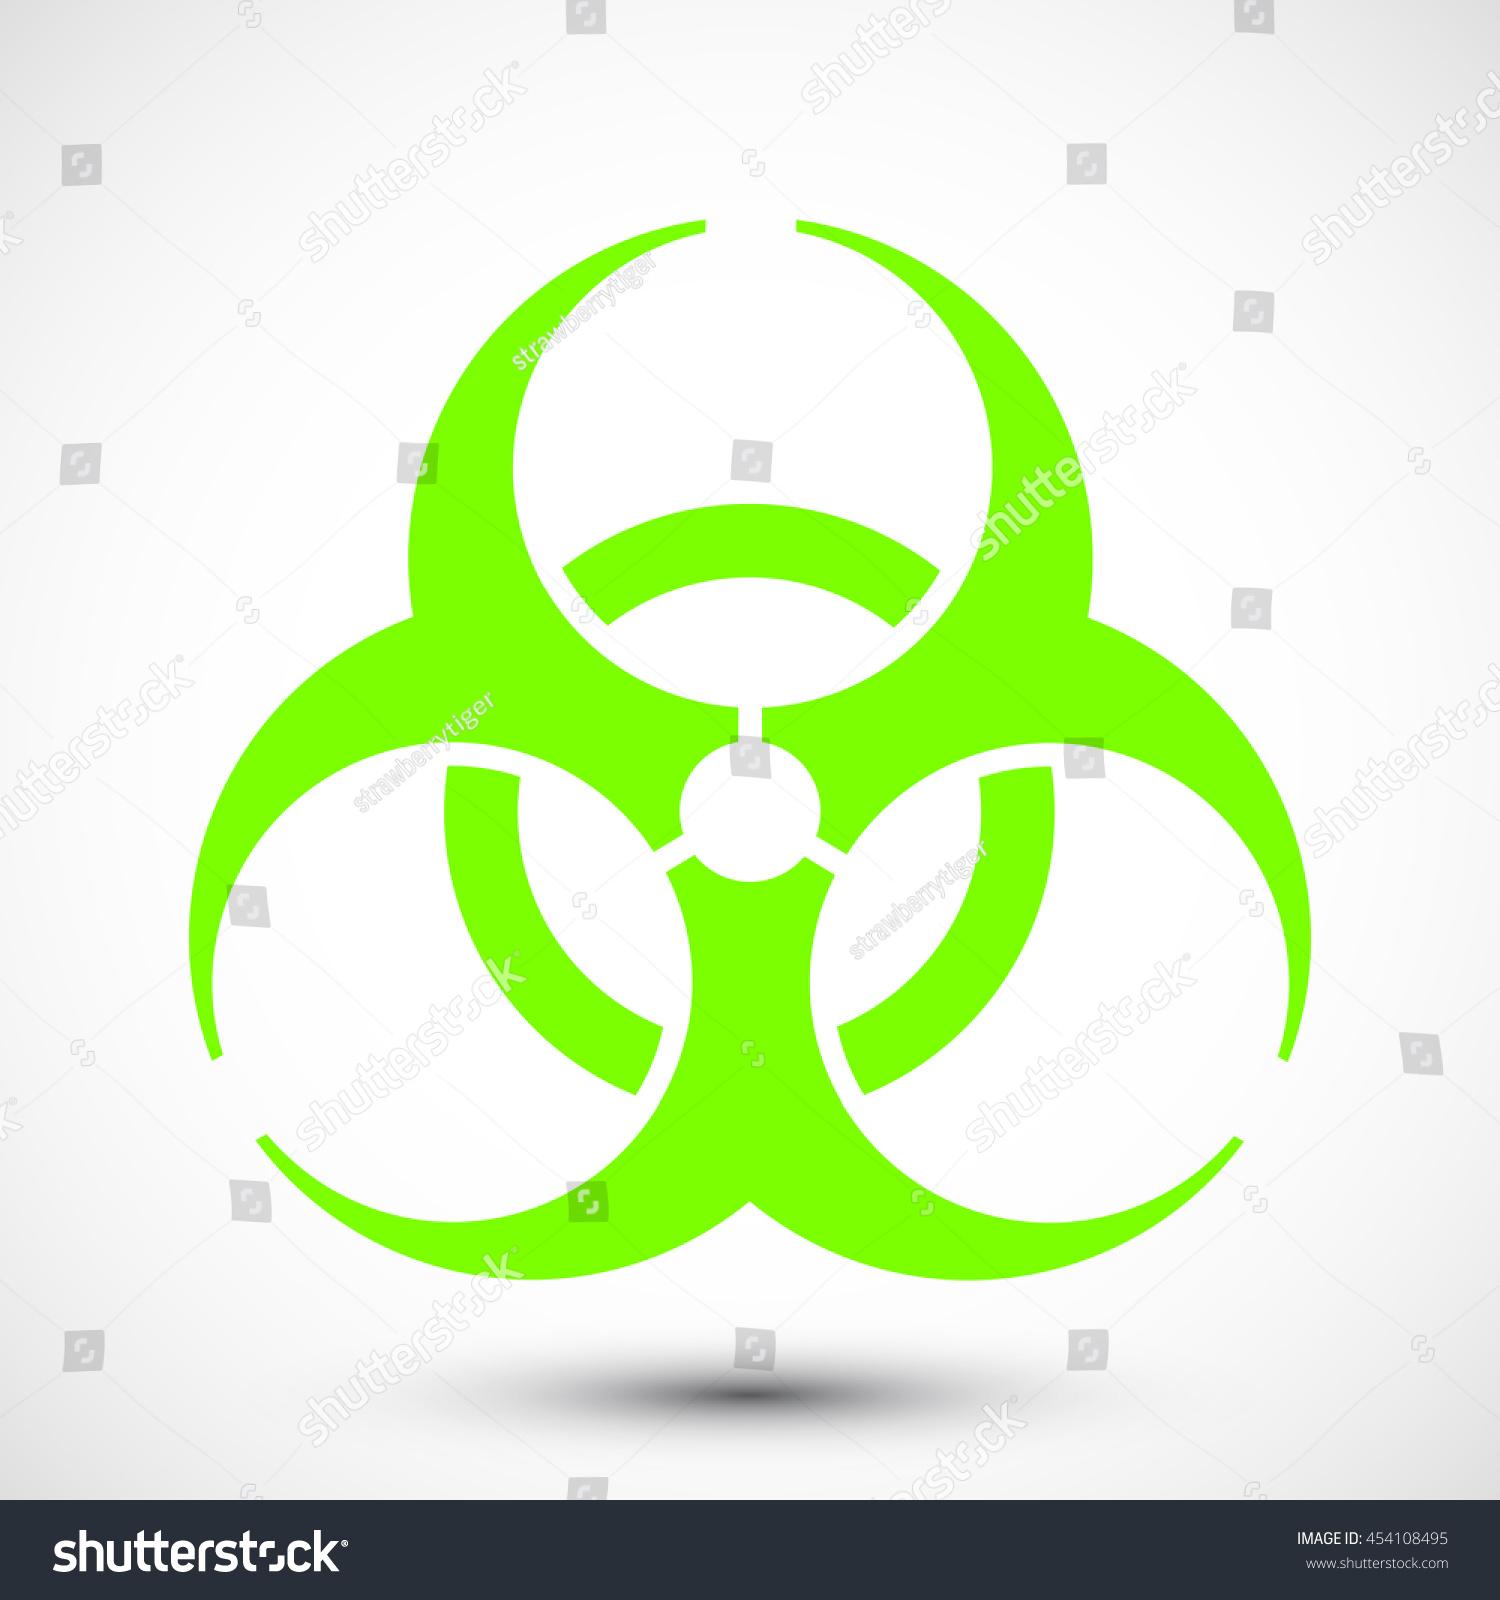 Biohazard Symbol On Background Illustration Biohazard Icon Stock